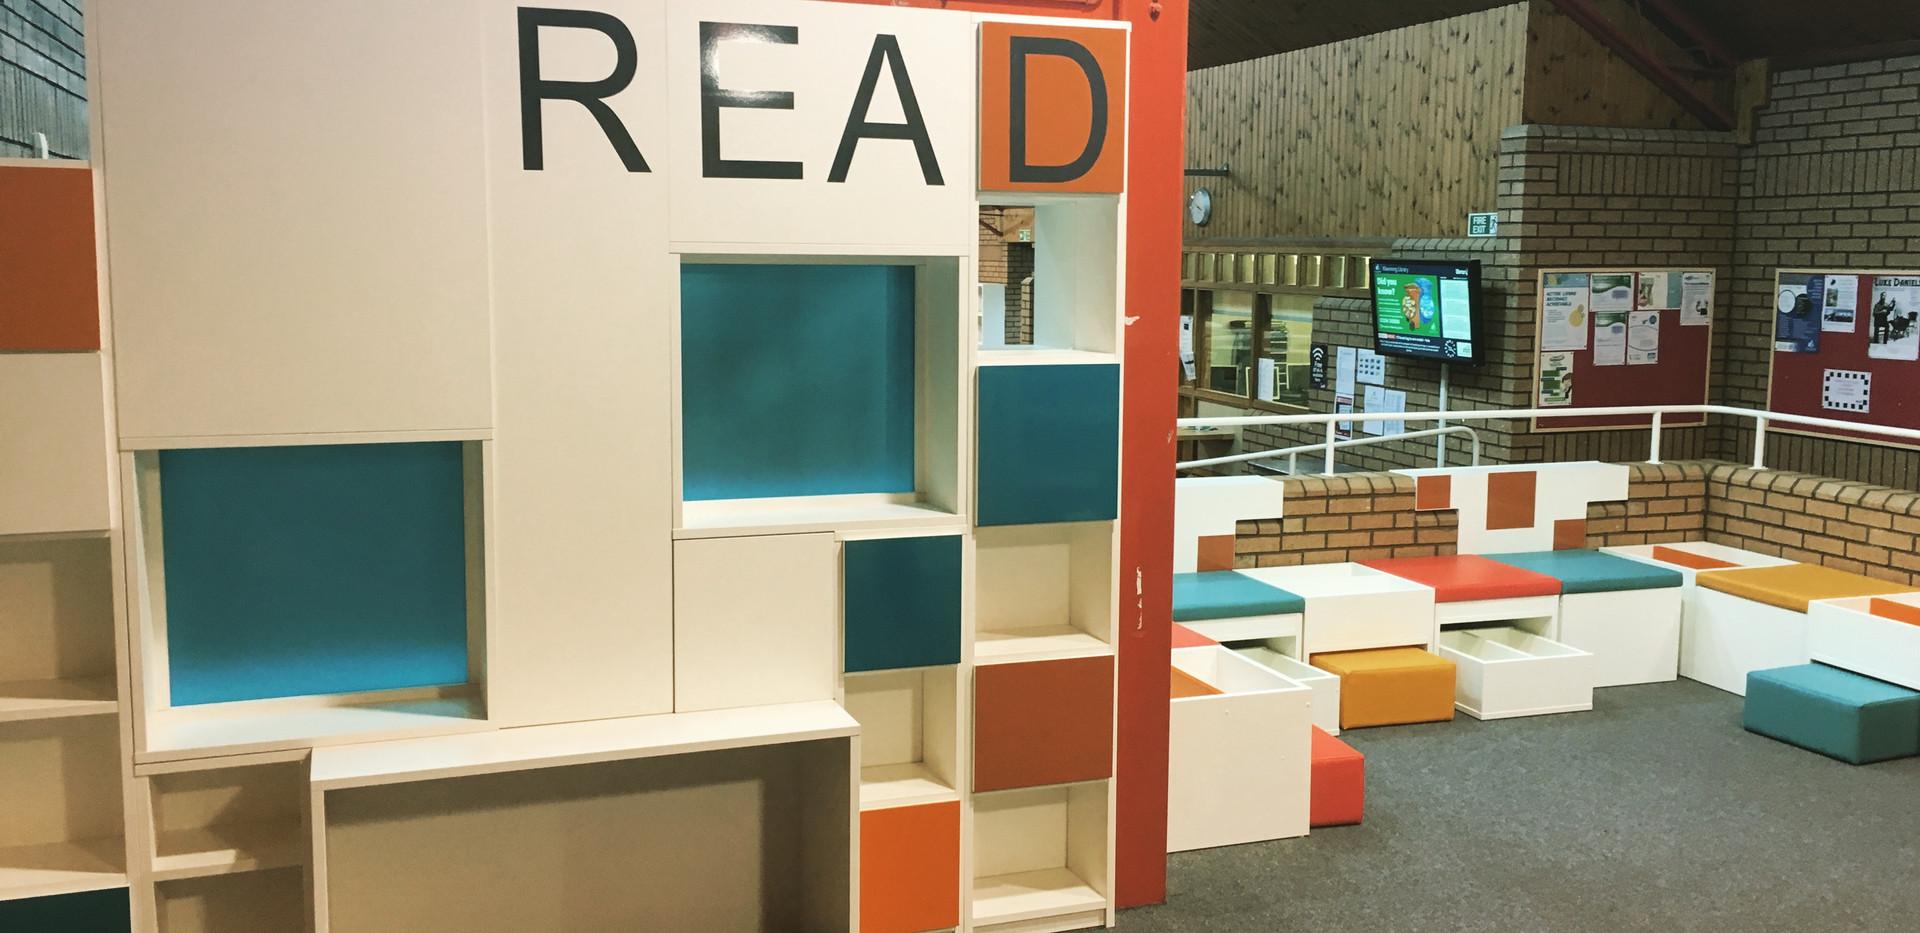 Kilwinning library.